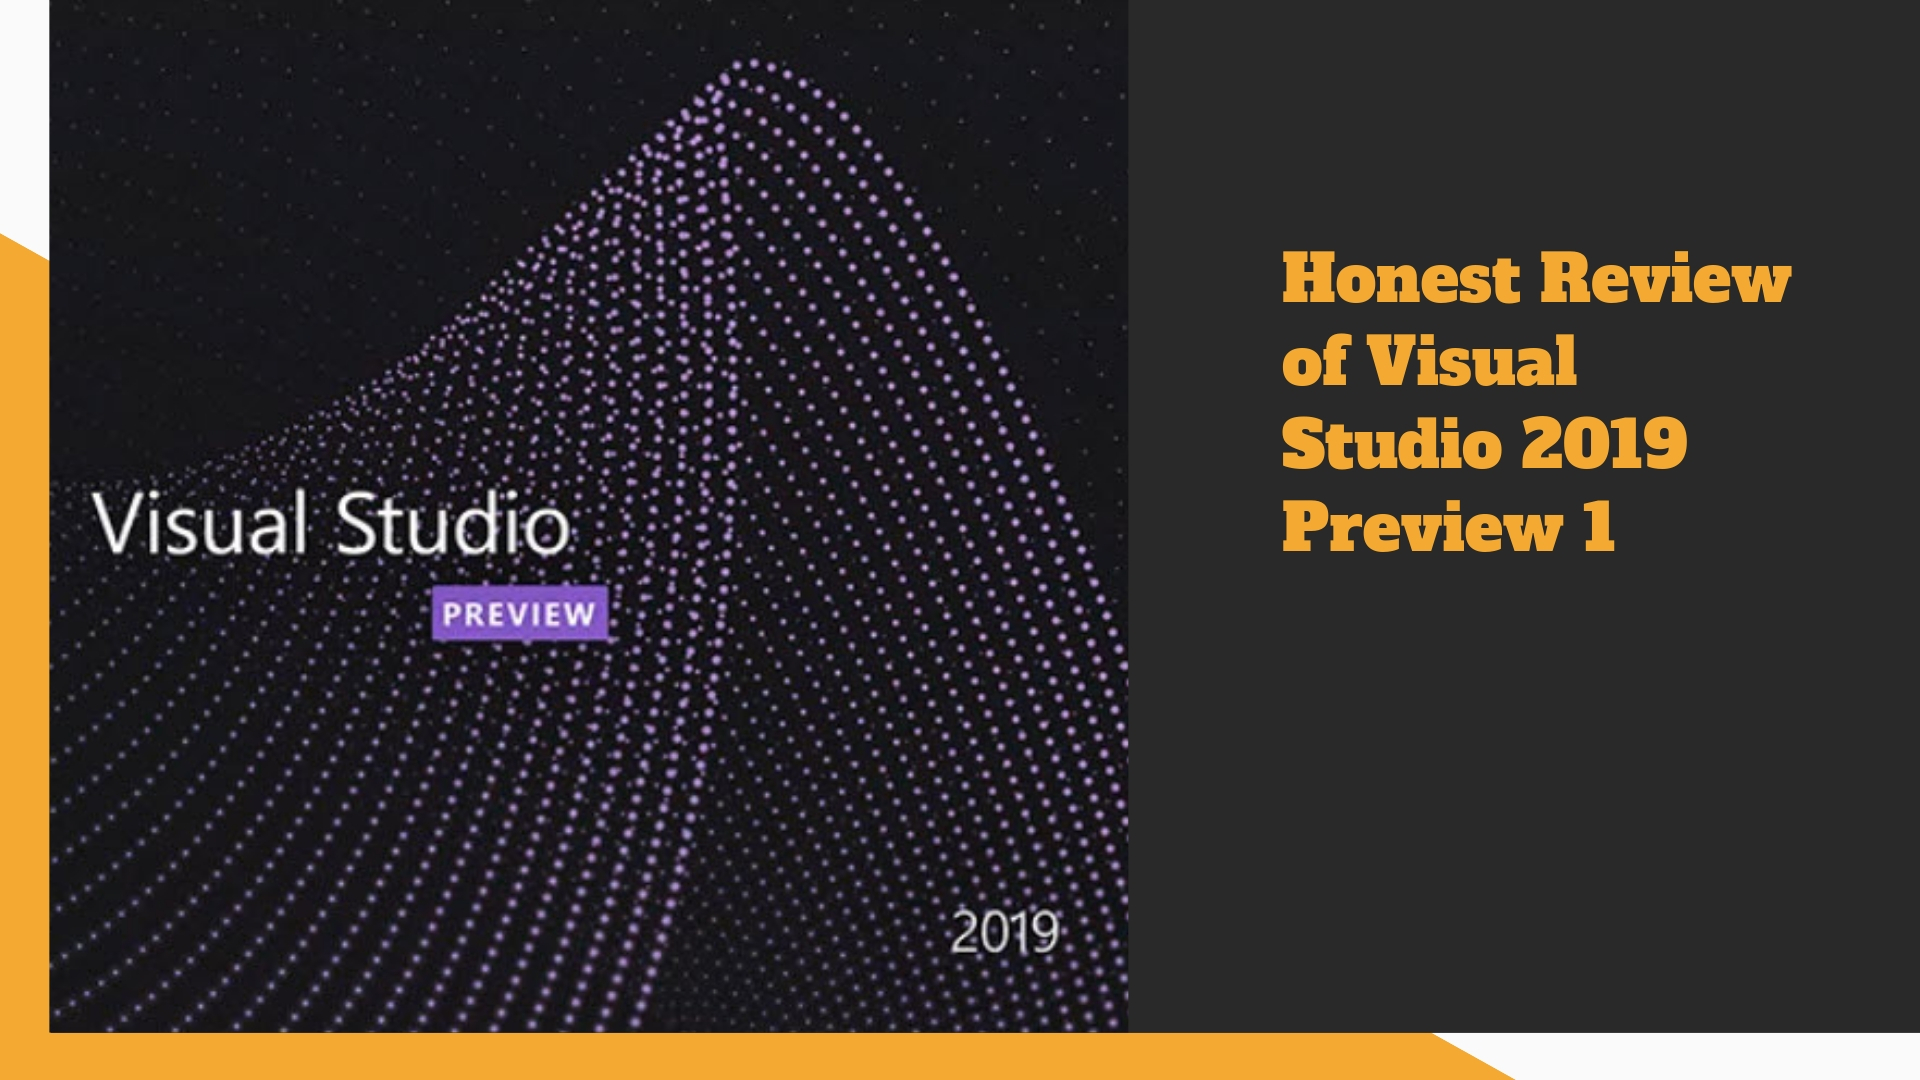 honest review of visual studio 2019 preview 1